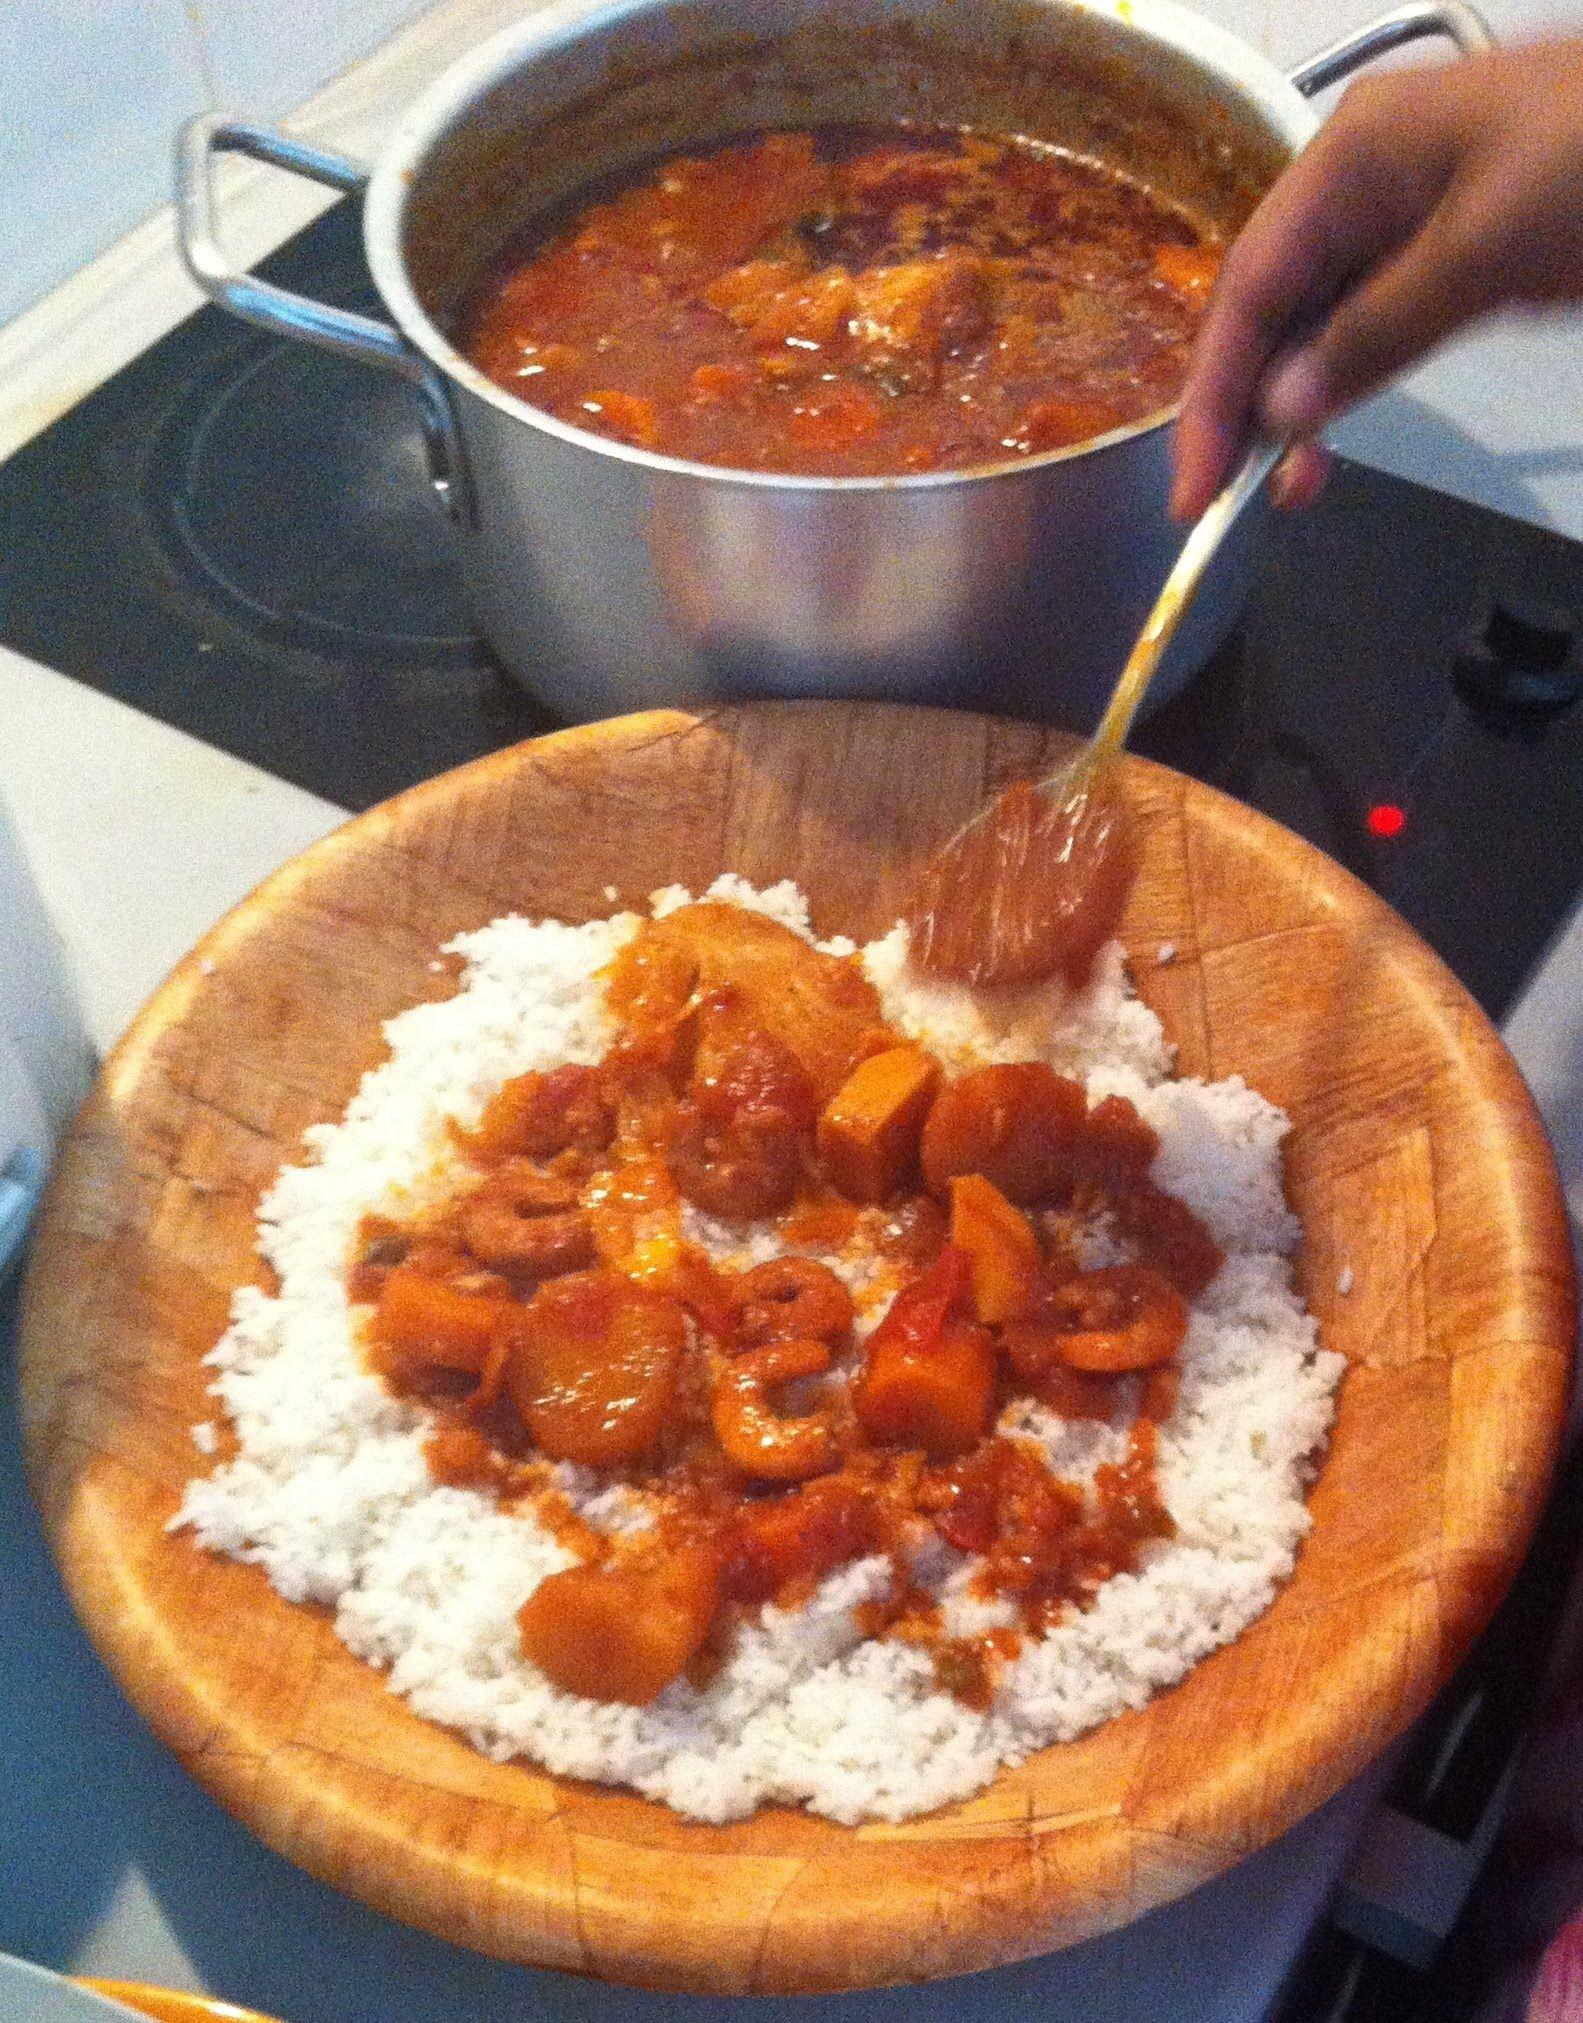 Recettes africaine facile et rapide - Cuisine africaine facile ...